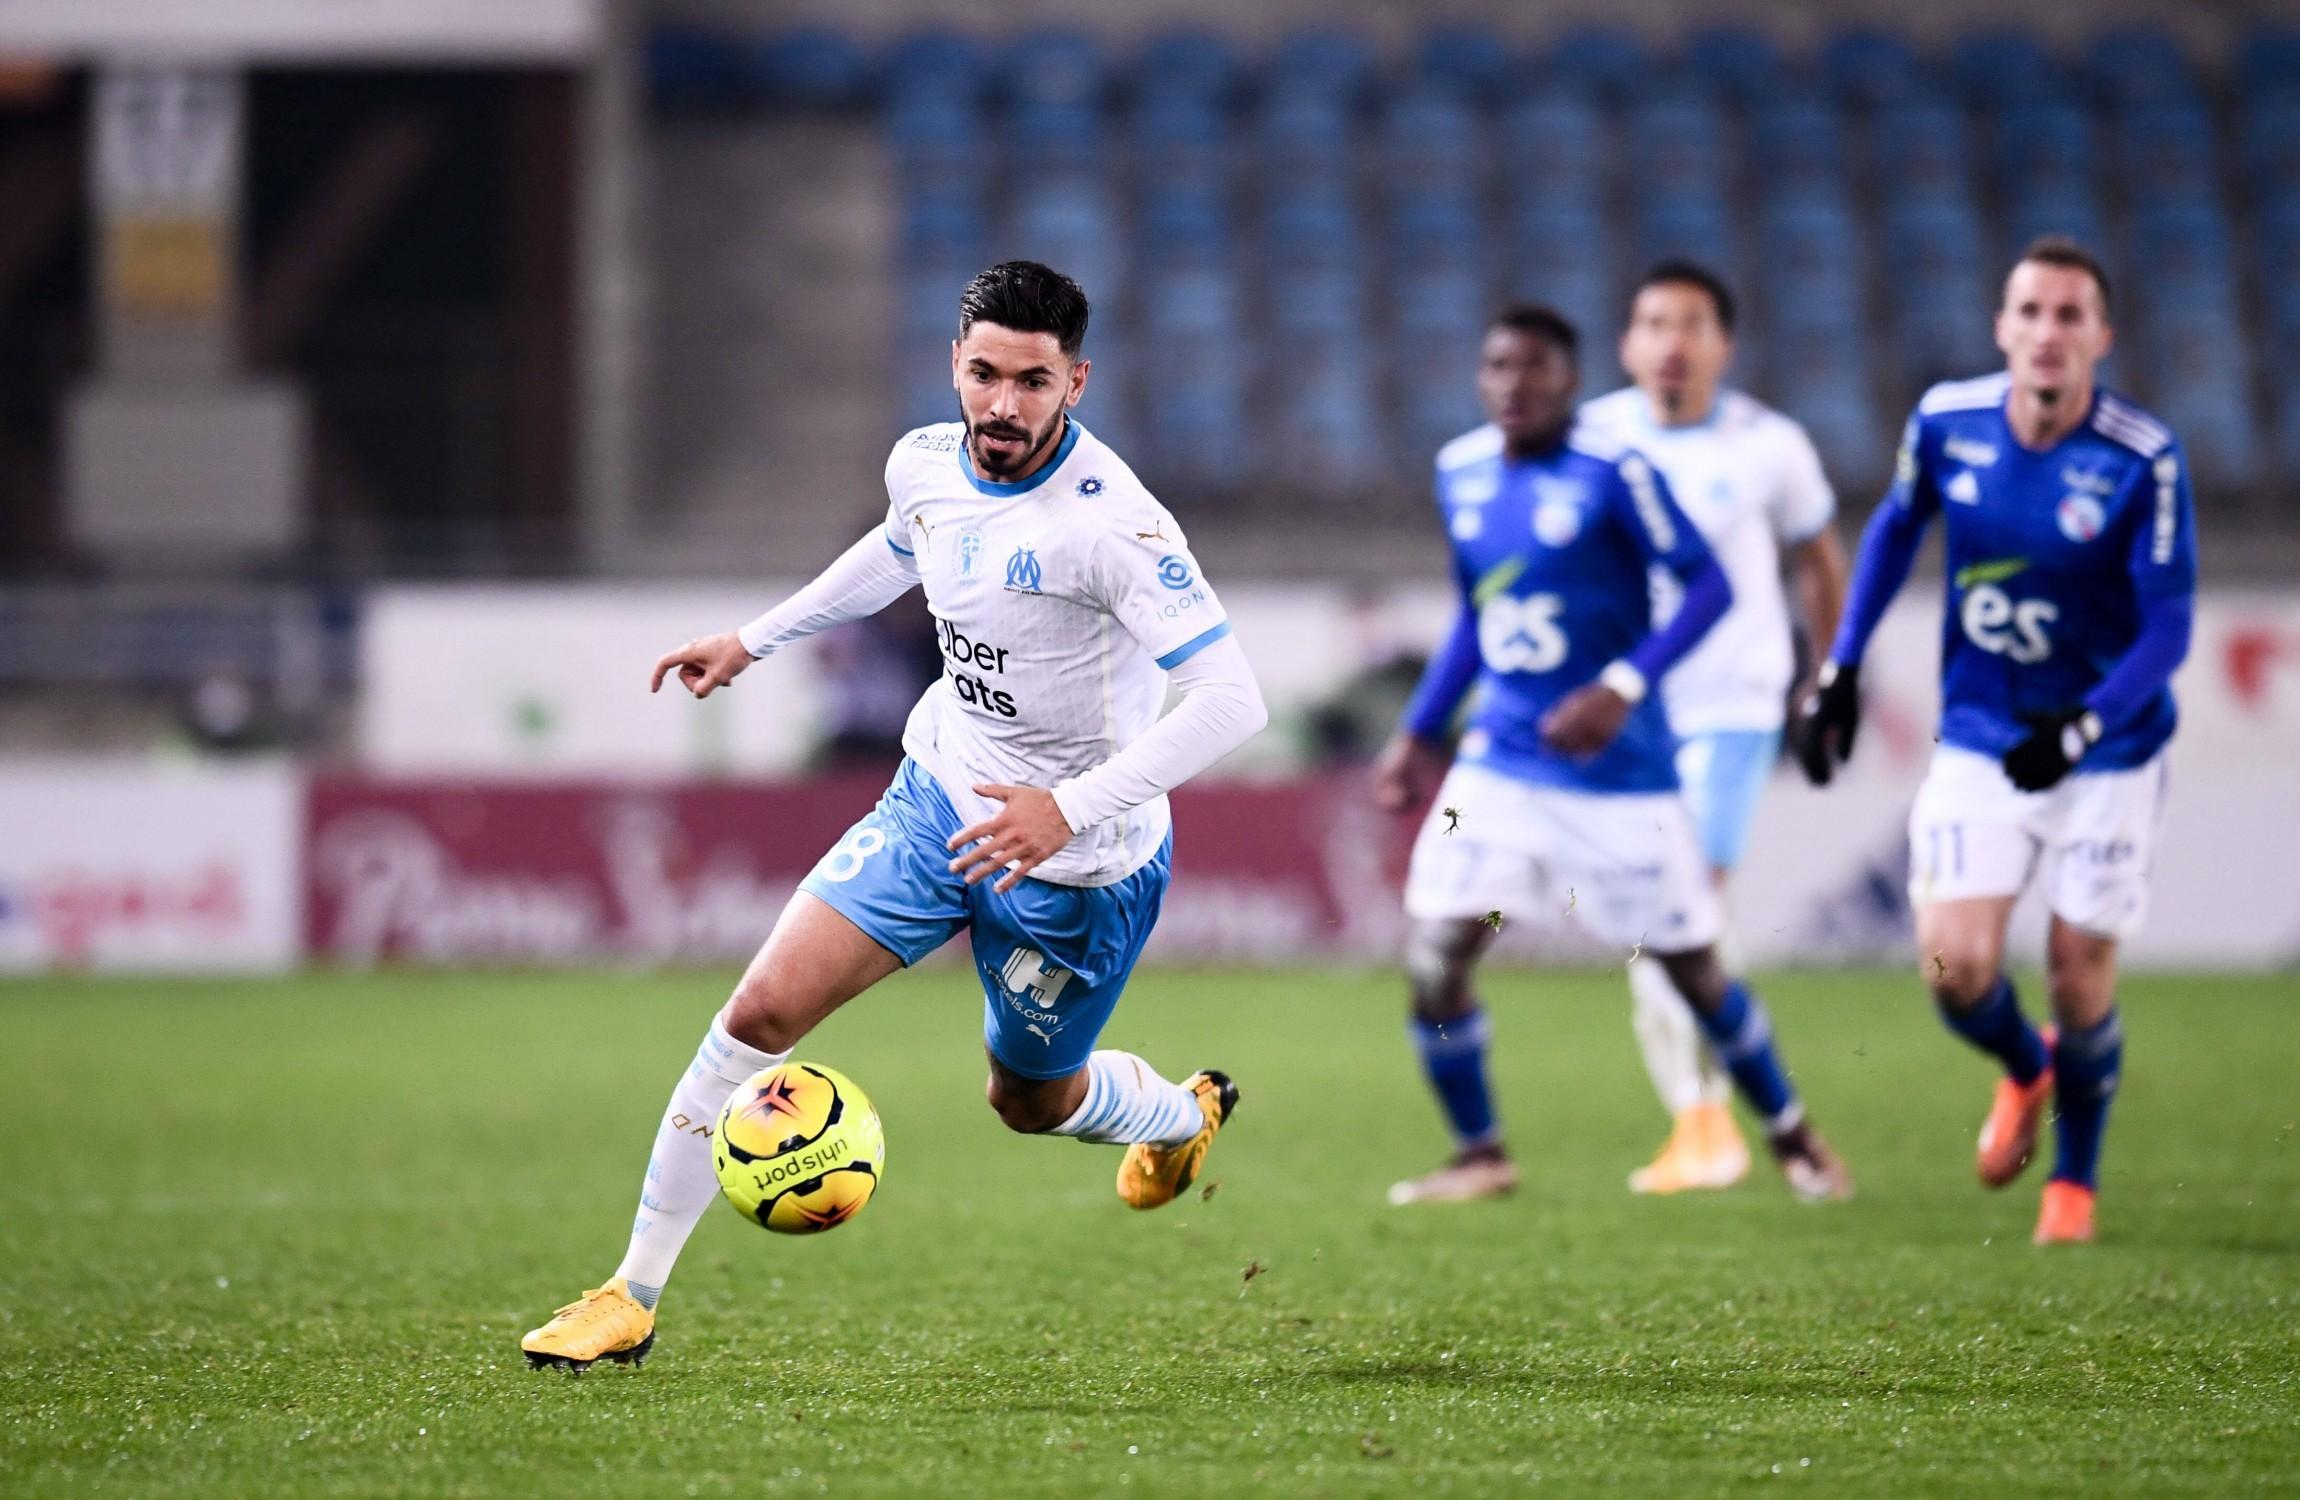 Villa complete £14m signing of midfielder Sanson from Marseille